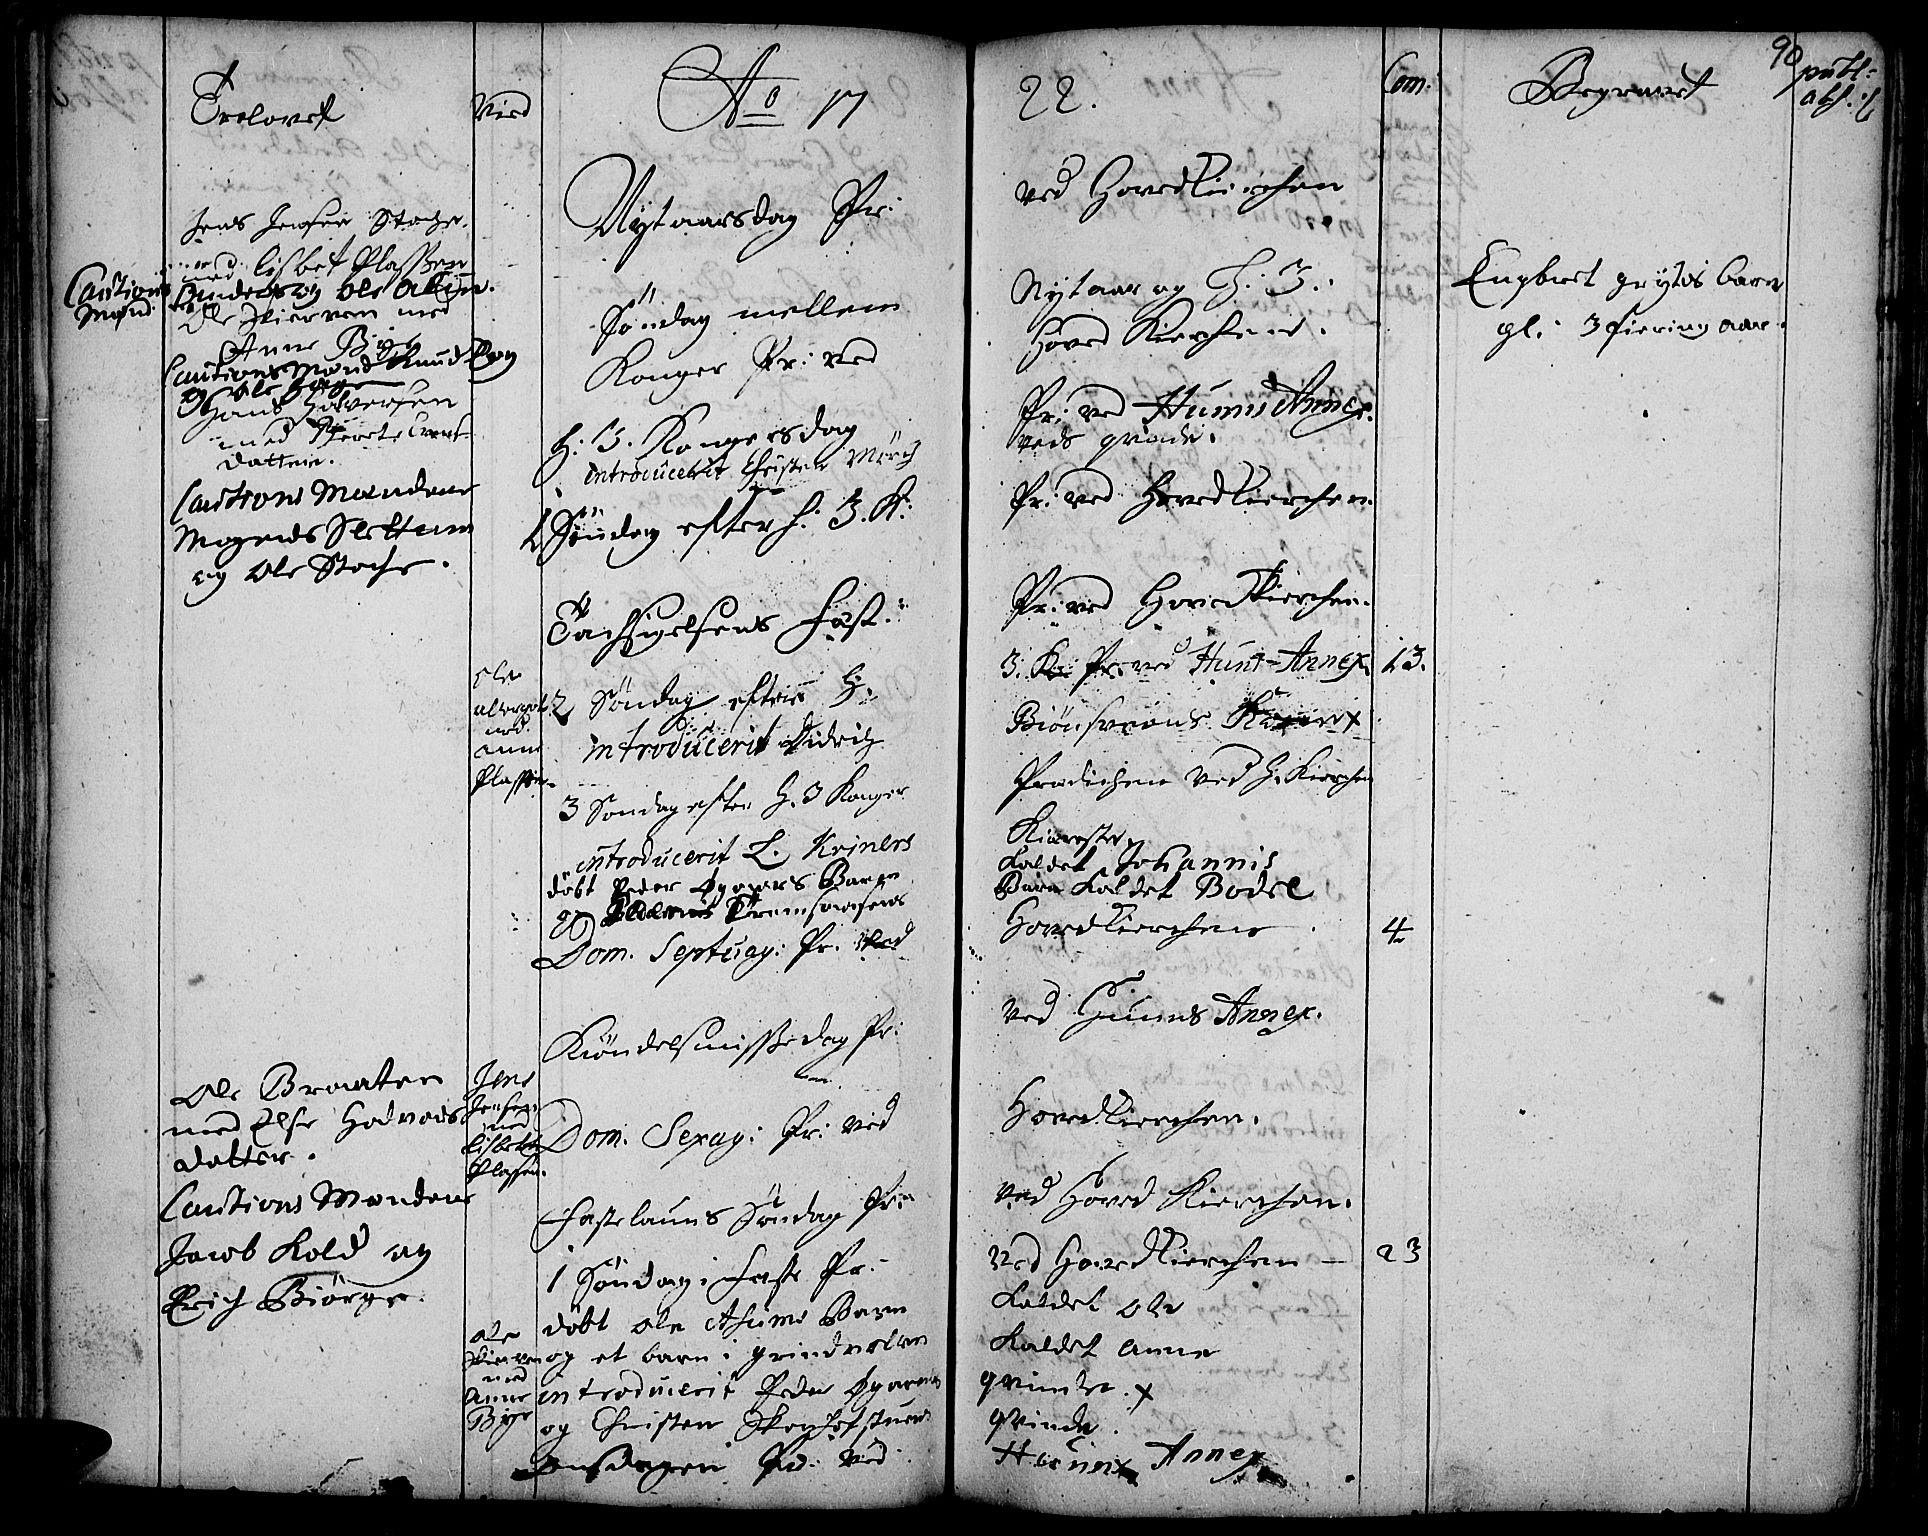 SAH, Vardal prestekontor, H/Ha/Haa/L0001: Ministerialbok nr. 1, 1706-1748, s. 90